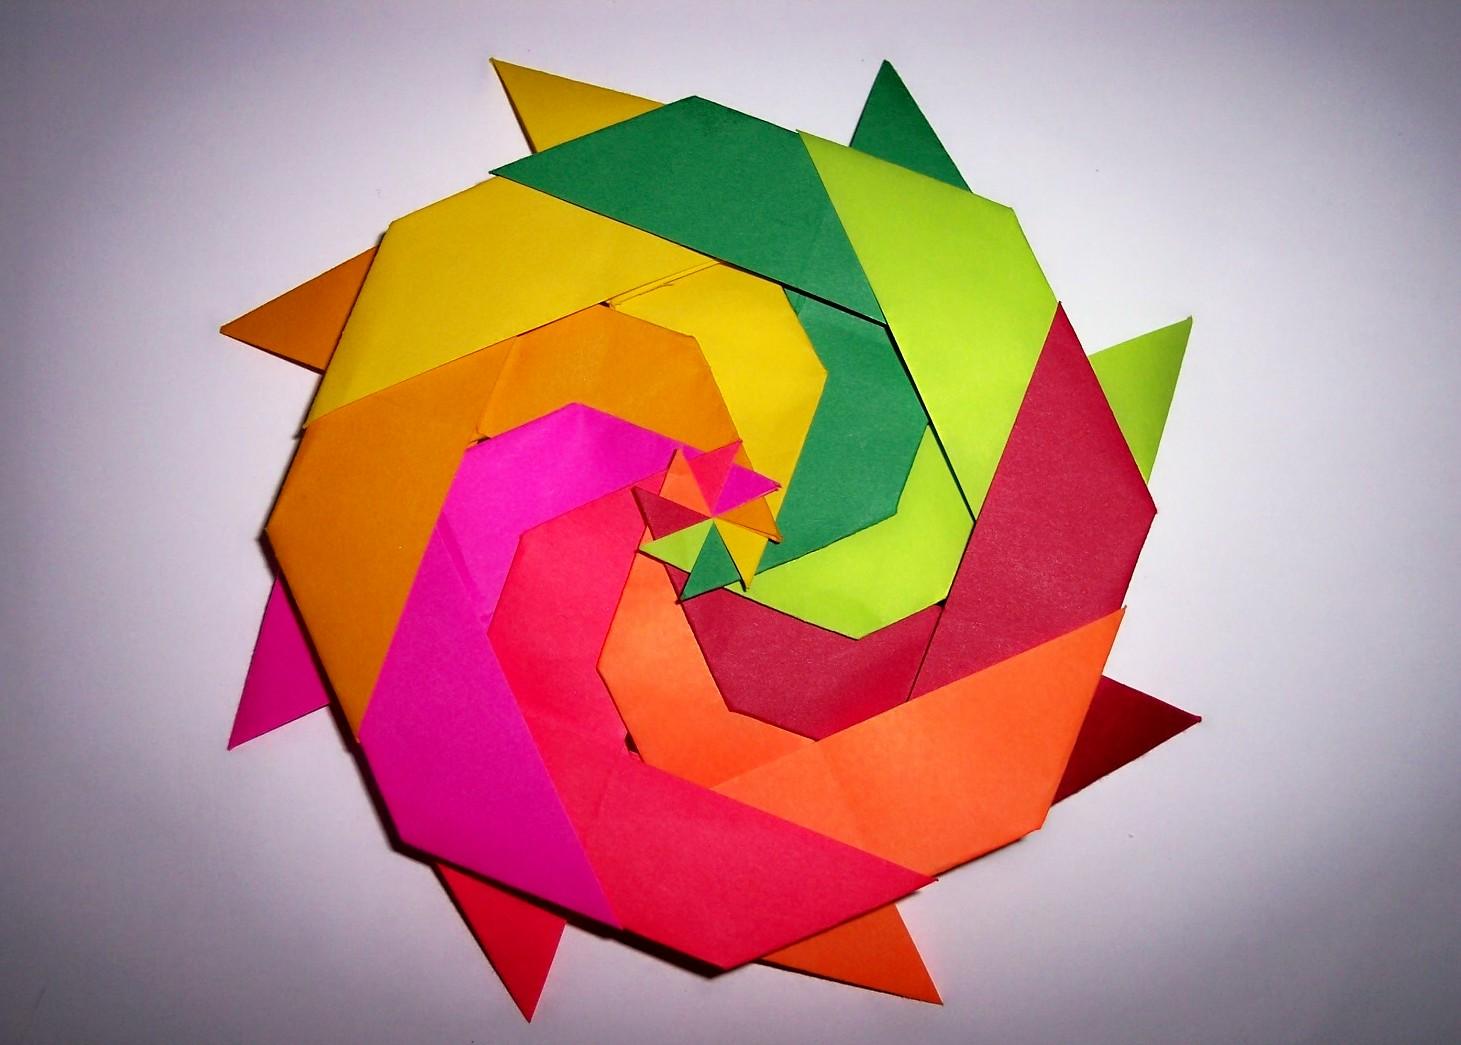 cool modular origami diagram cooker hob wiring more madness flotsam and jetsam